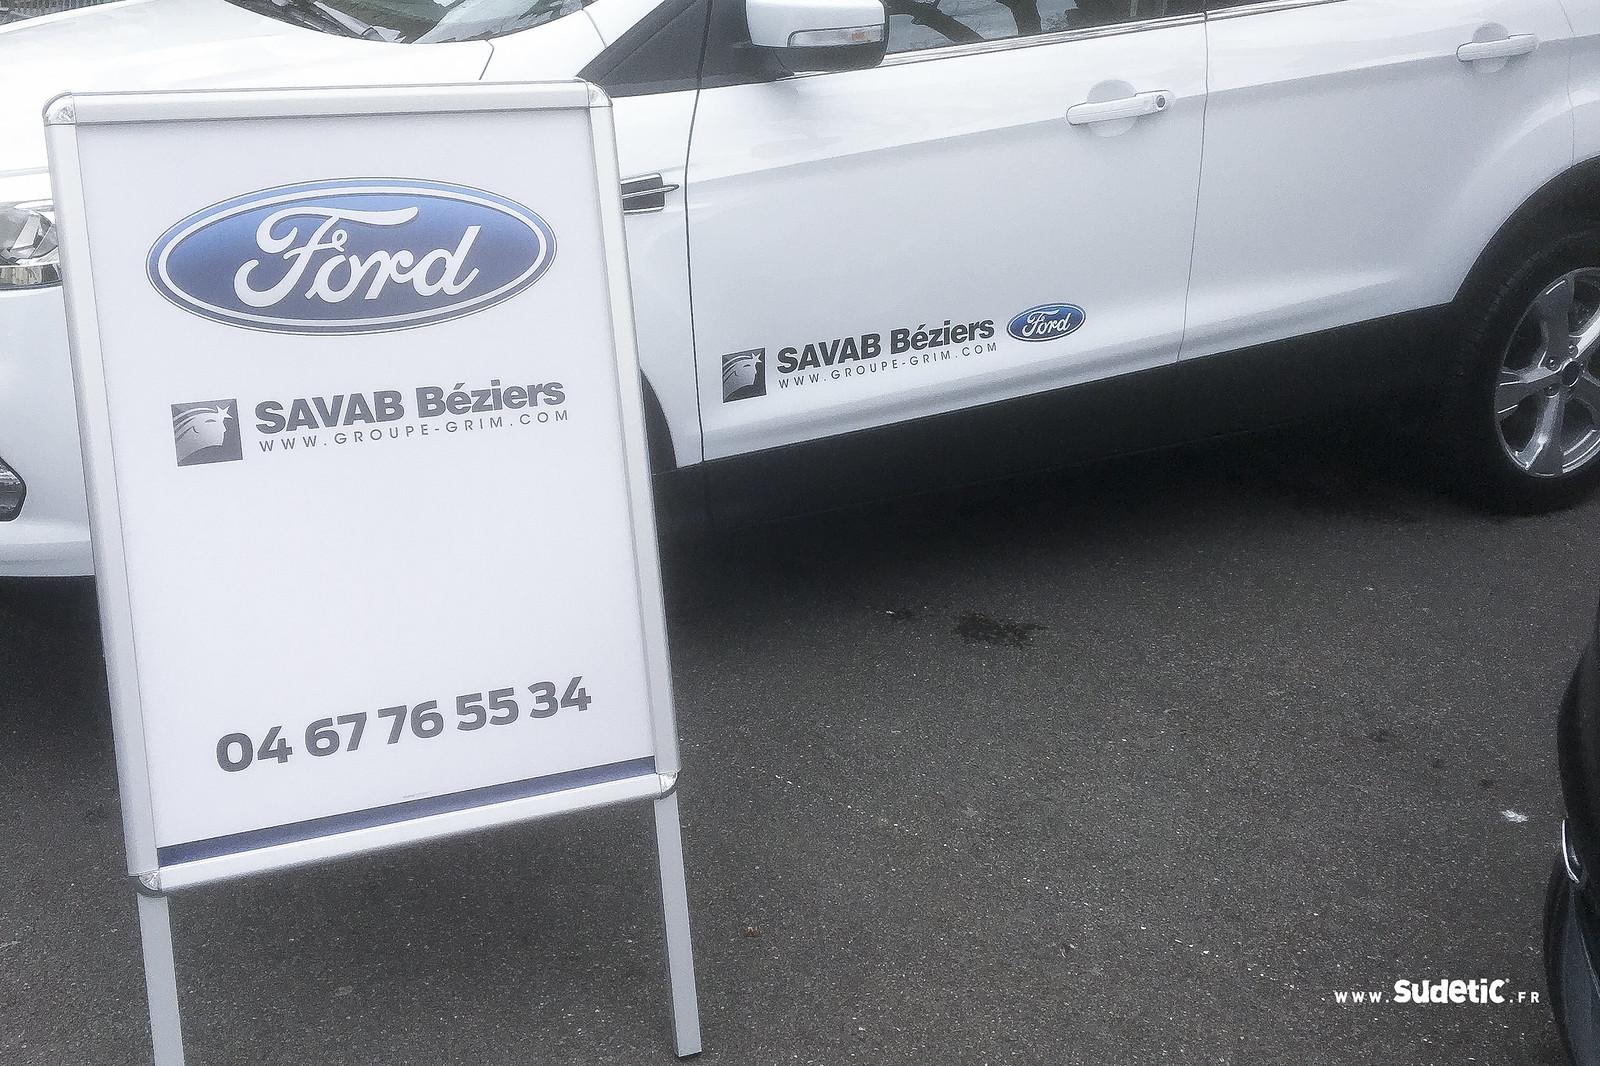 Sudetic chevalet et adhésifs Ford SAVAB